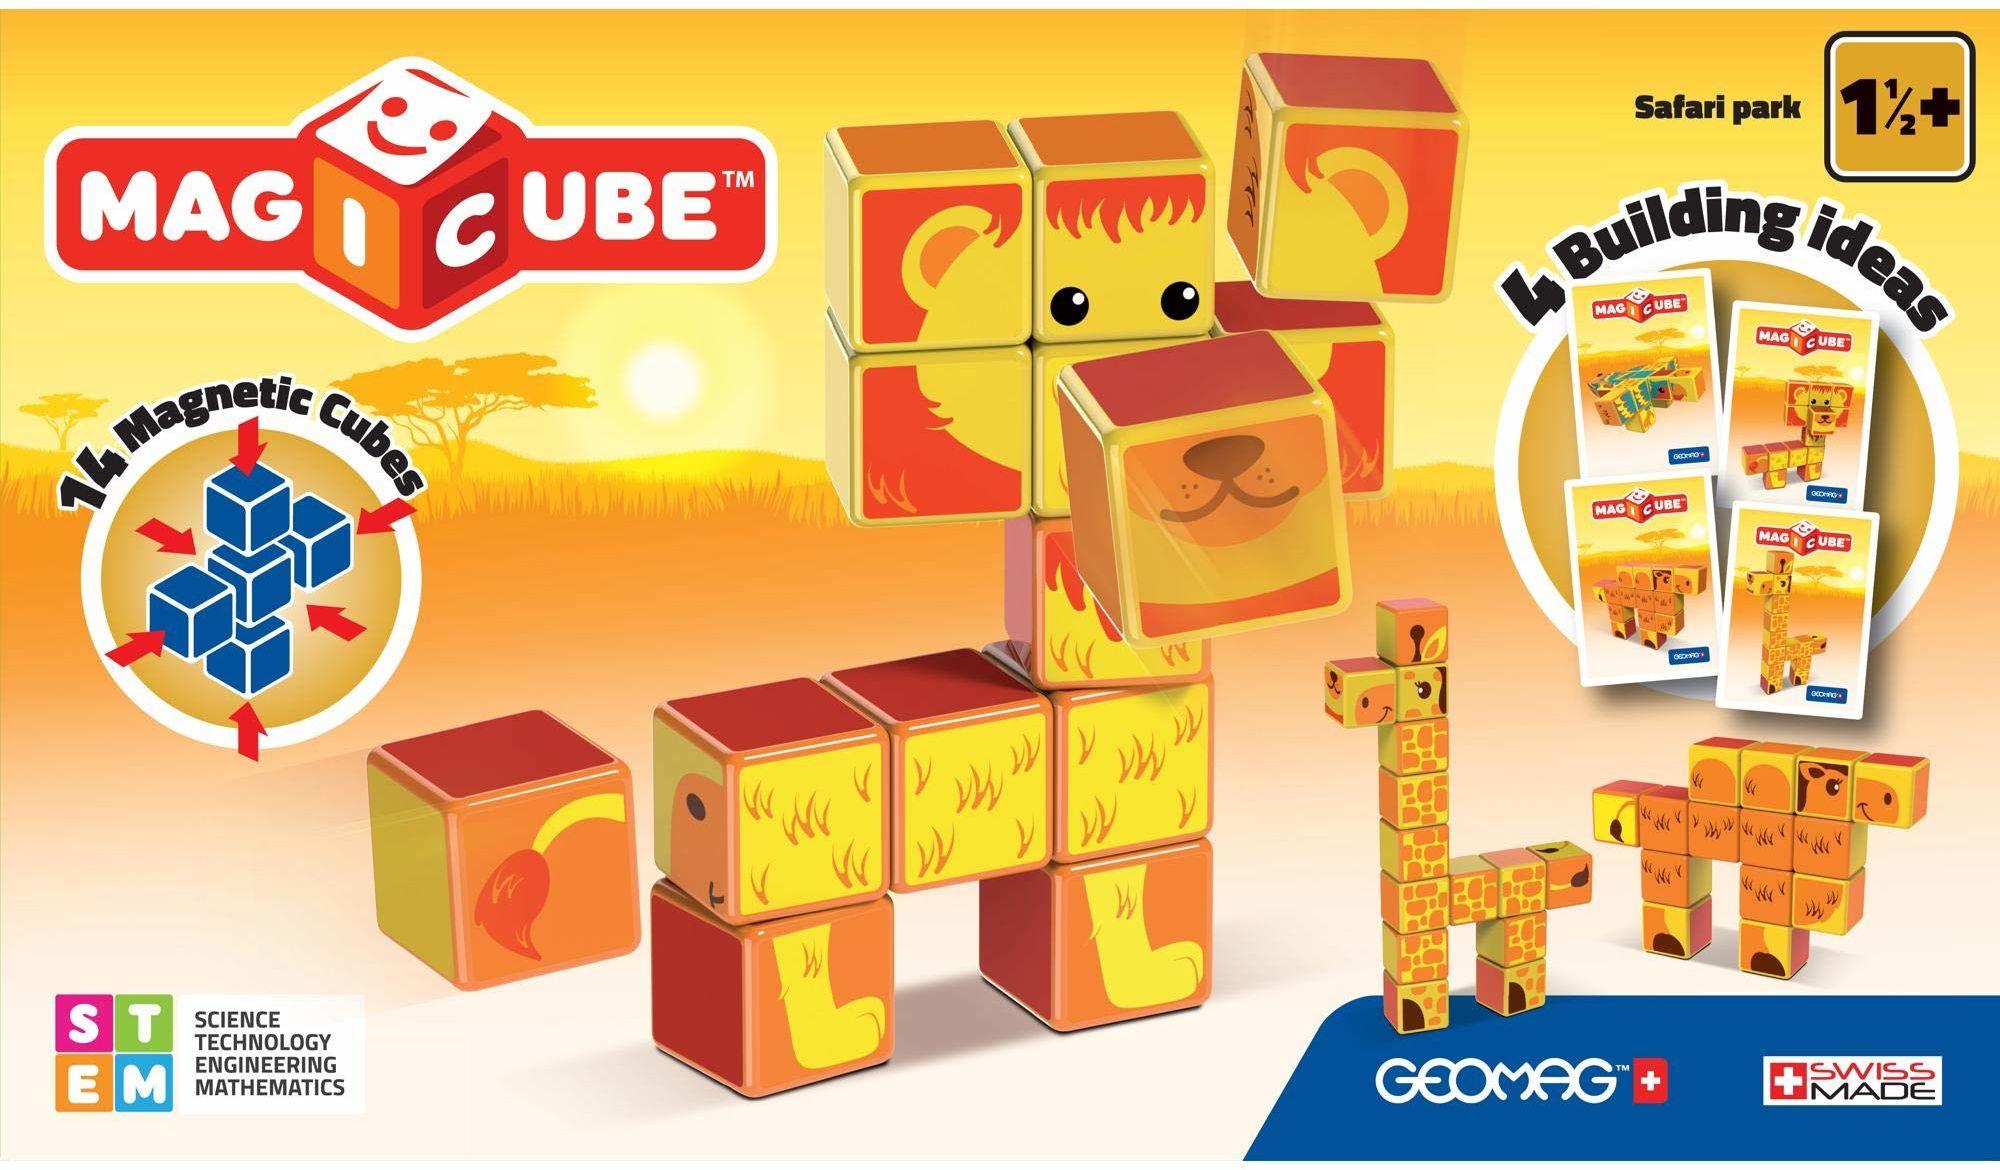 Geomag- Safari Park Magicube Magnetic Cubes, wielokolorowe, PF.331.135.00